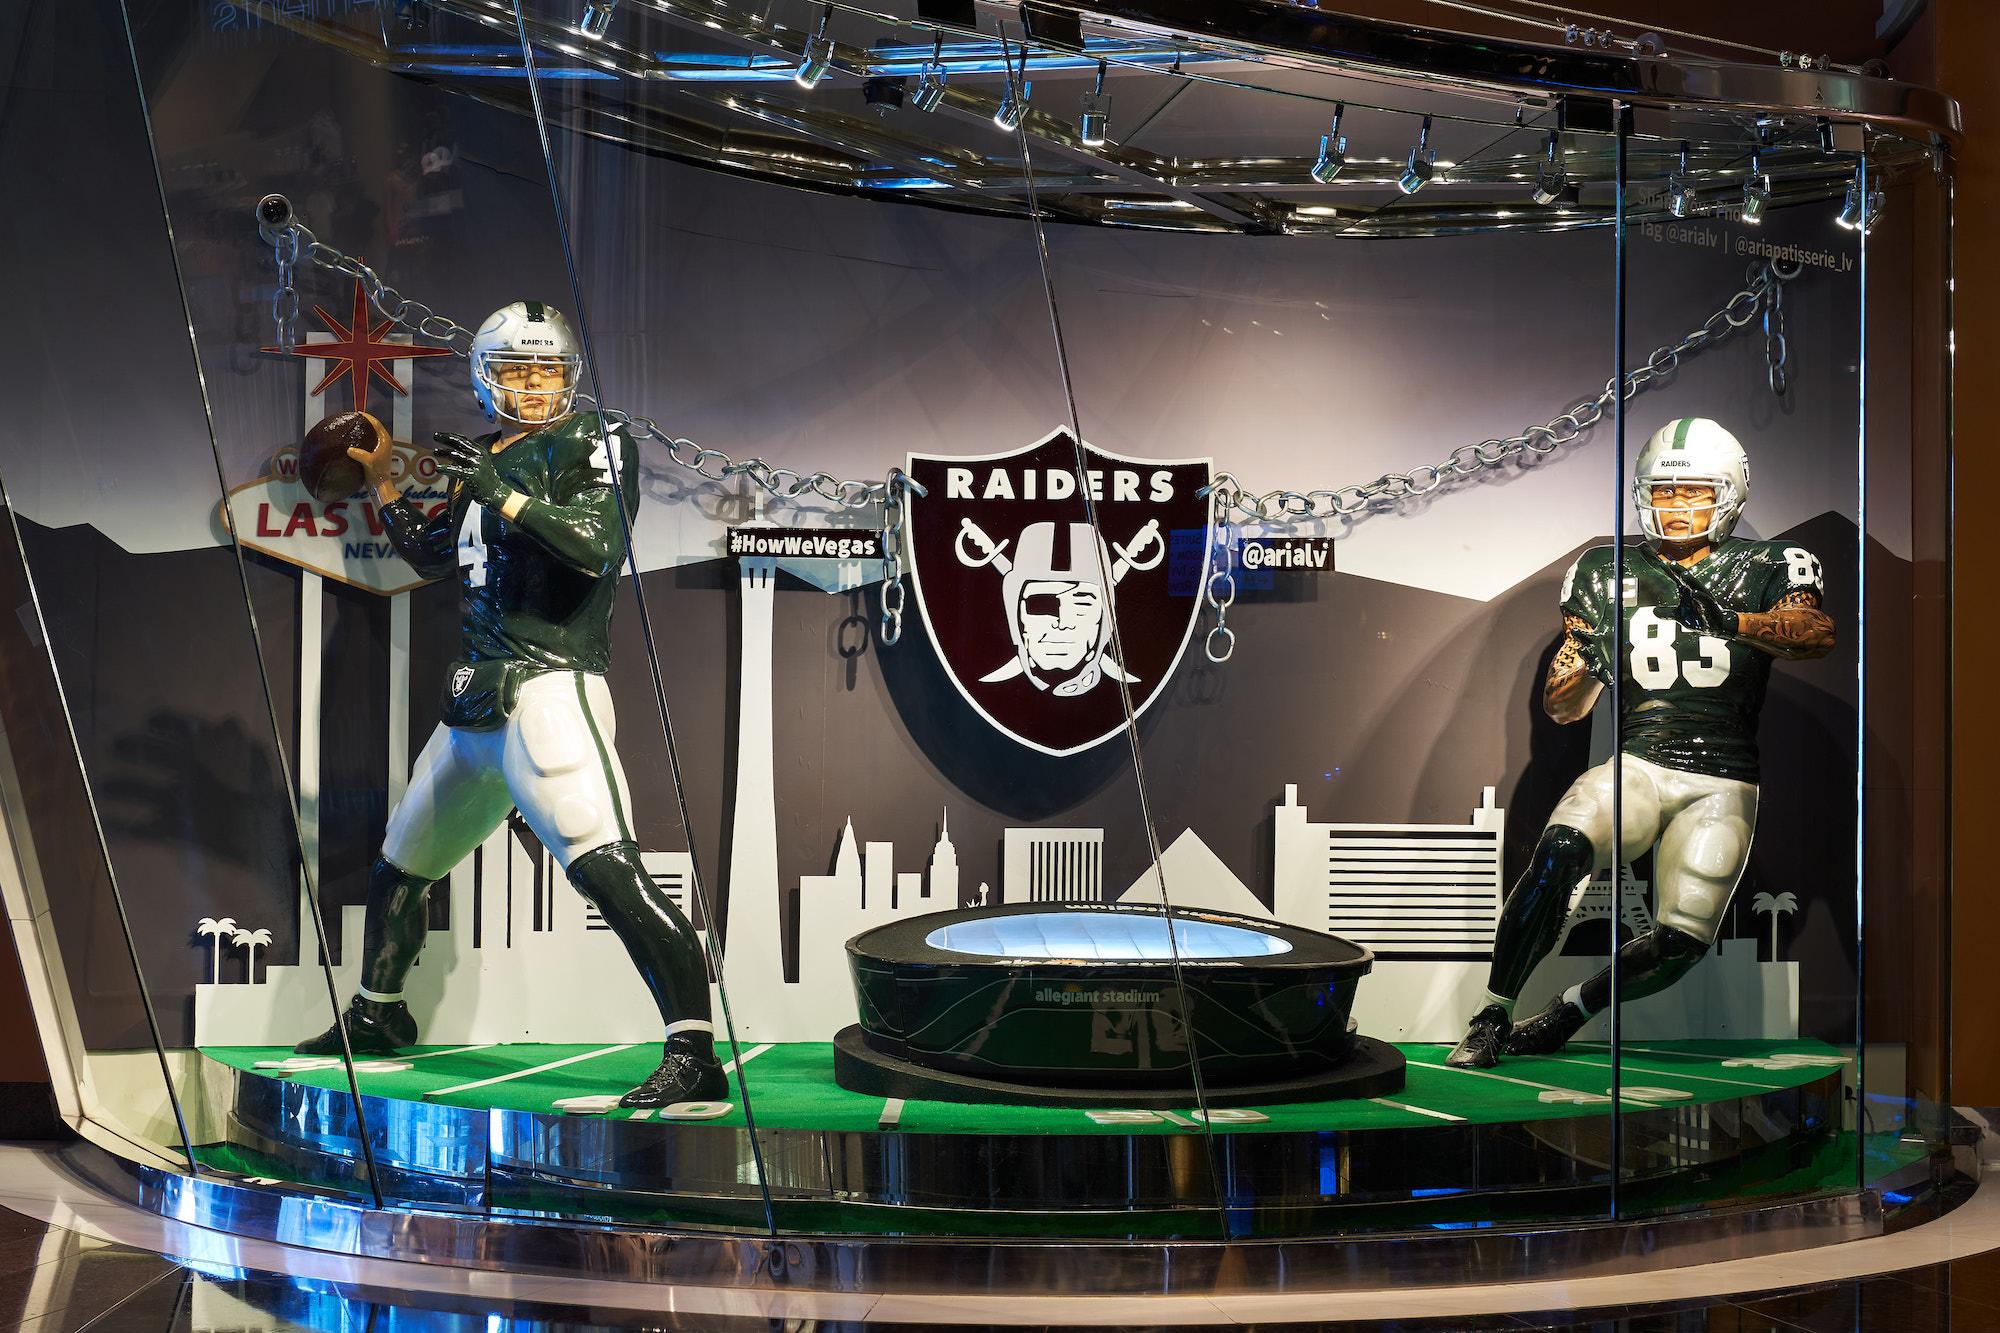 A replica of a Las Vegas Raiders quarterback and tight end